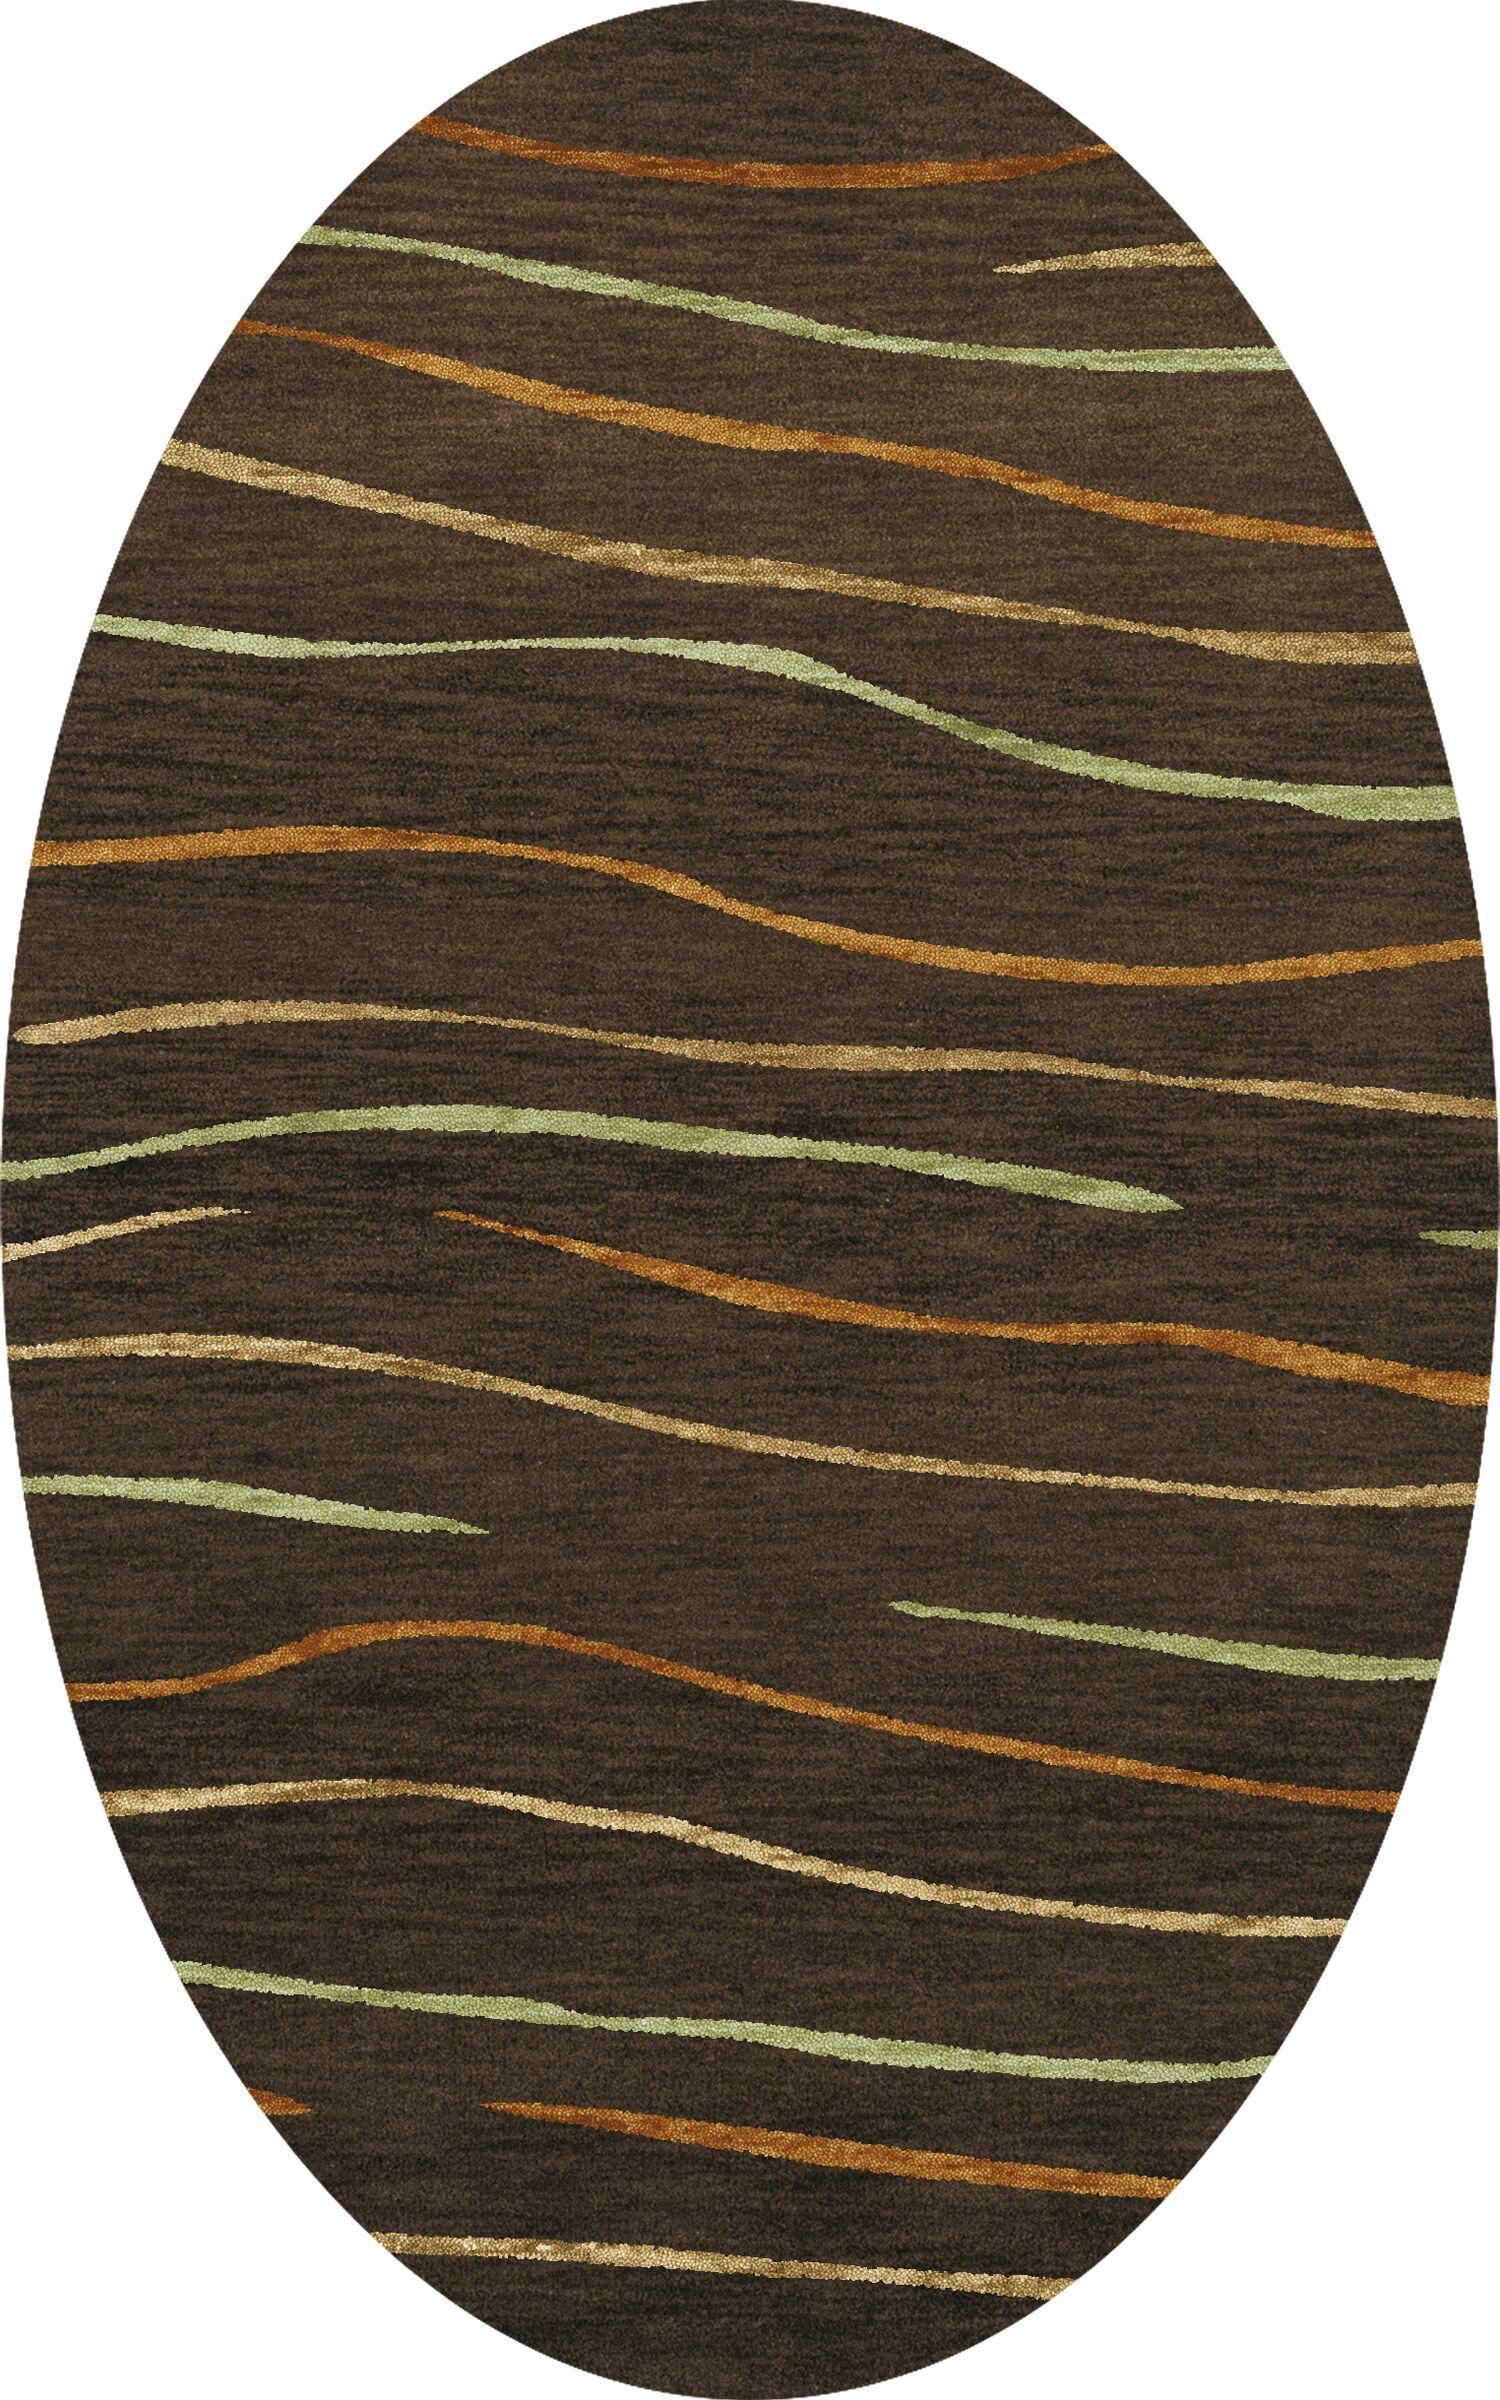 Bella Machine Woven Wool Brown Area Rug Rug Size: Oval 6' x 9'